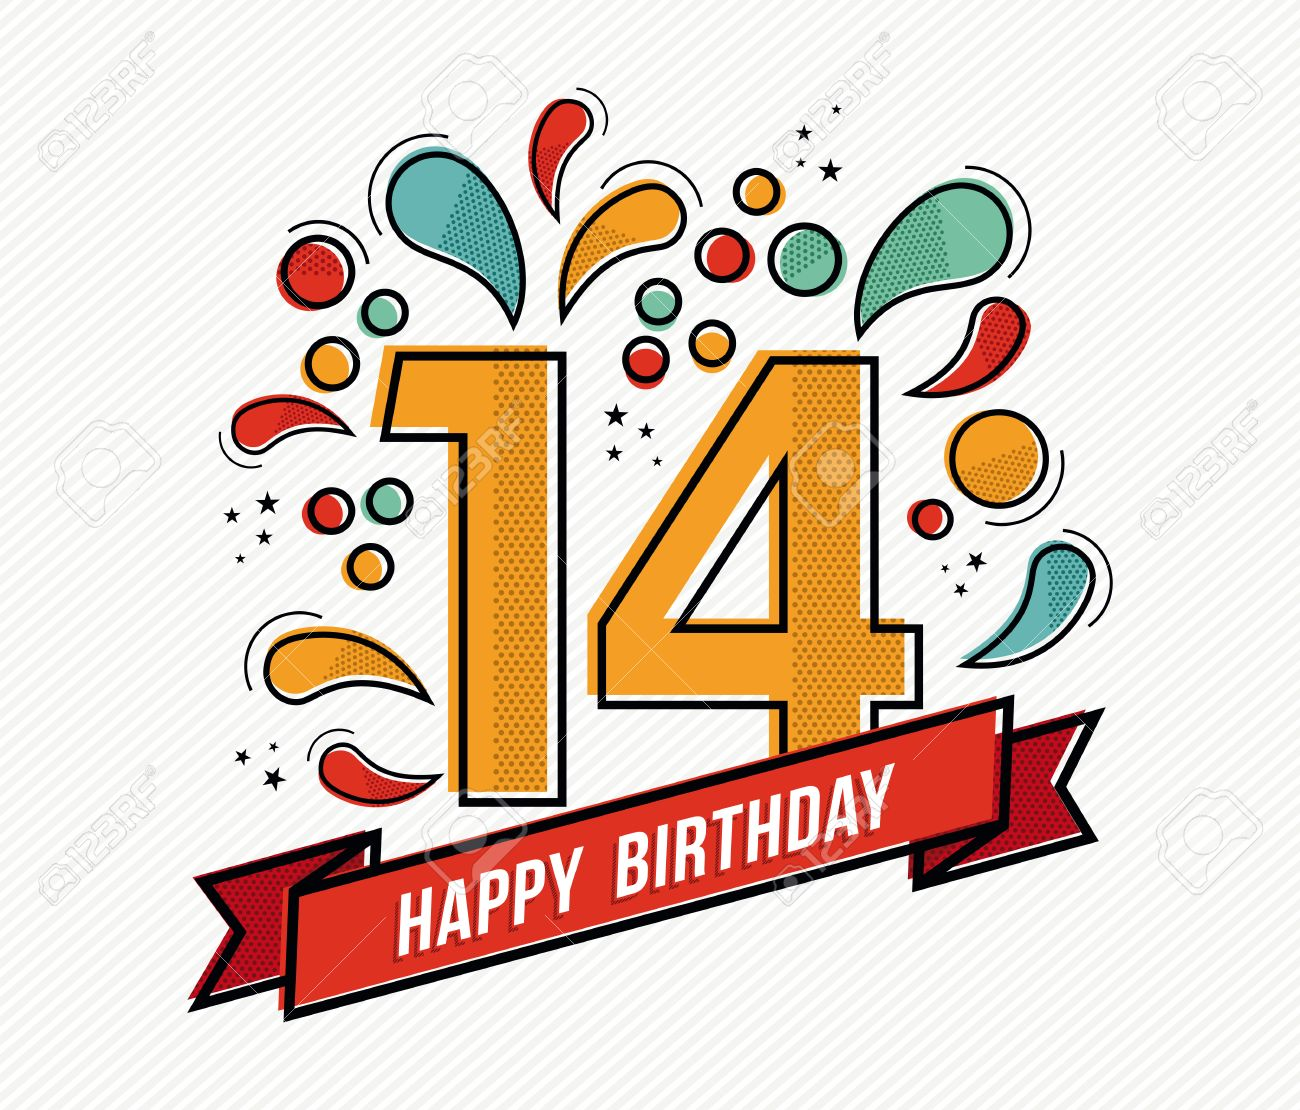 Themed Birthday Balloons Add Life to the Birthday Bash